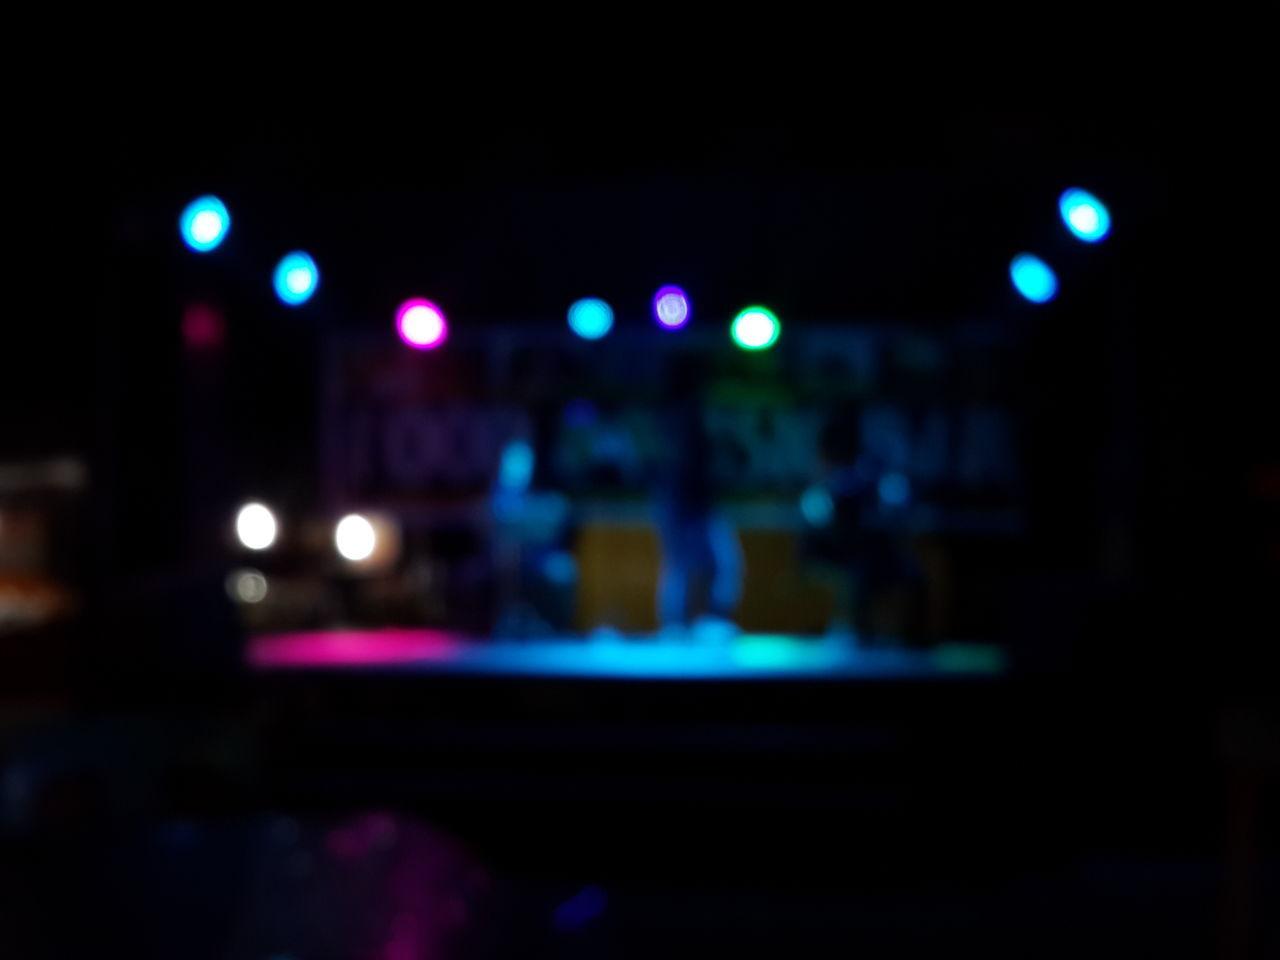 illuminated, night, lighting equipment, nightlife, large group of people, indoors, real people, stage light, nightclub, stage - performance space, audience, performance, defocused, disco lights, crowd, close-up, people